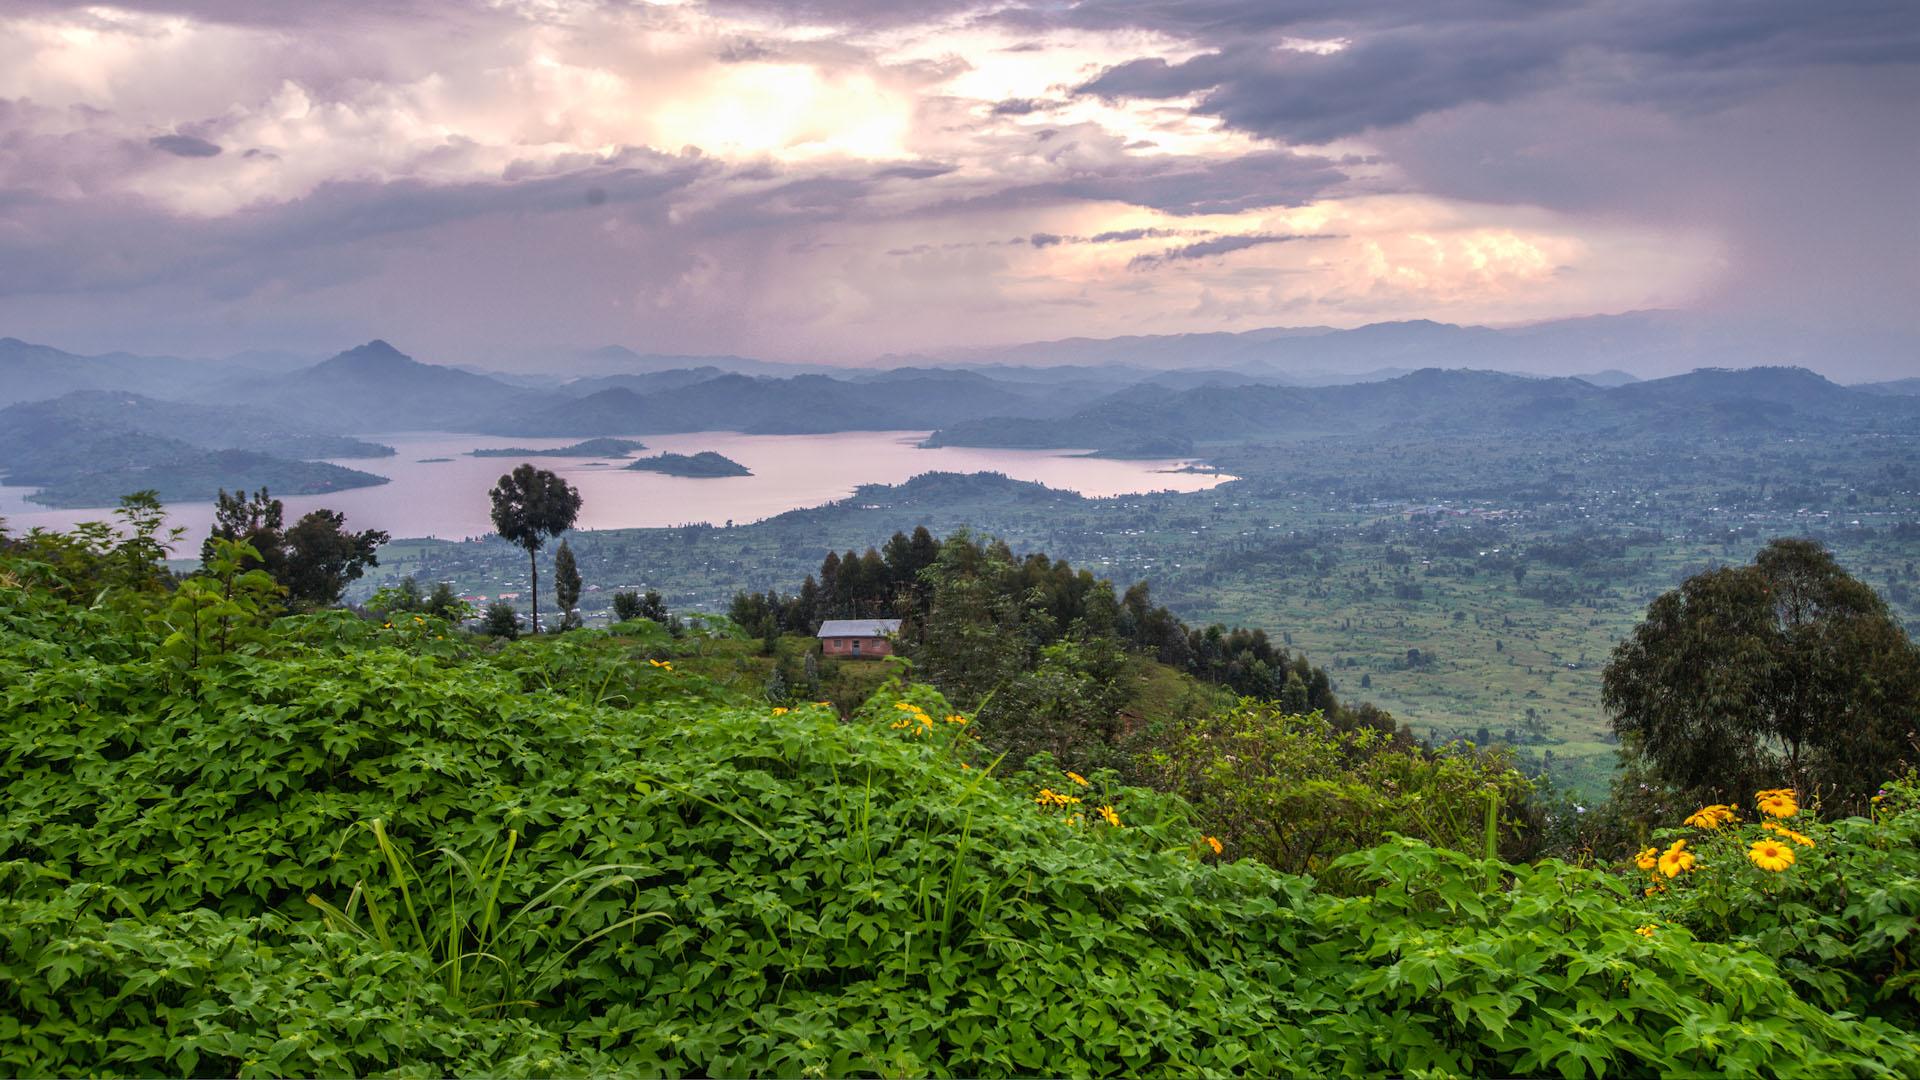 rwanda-volcanoes-virunga-lodge-randazoo-view-landscape1